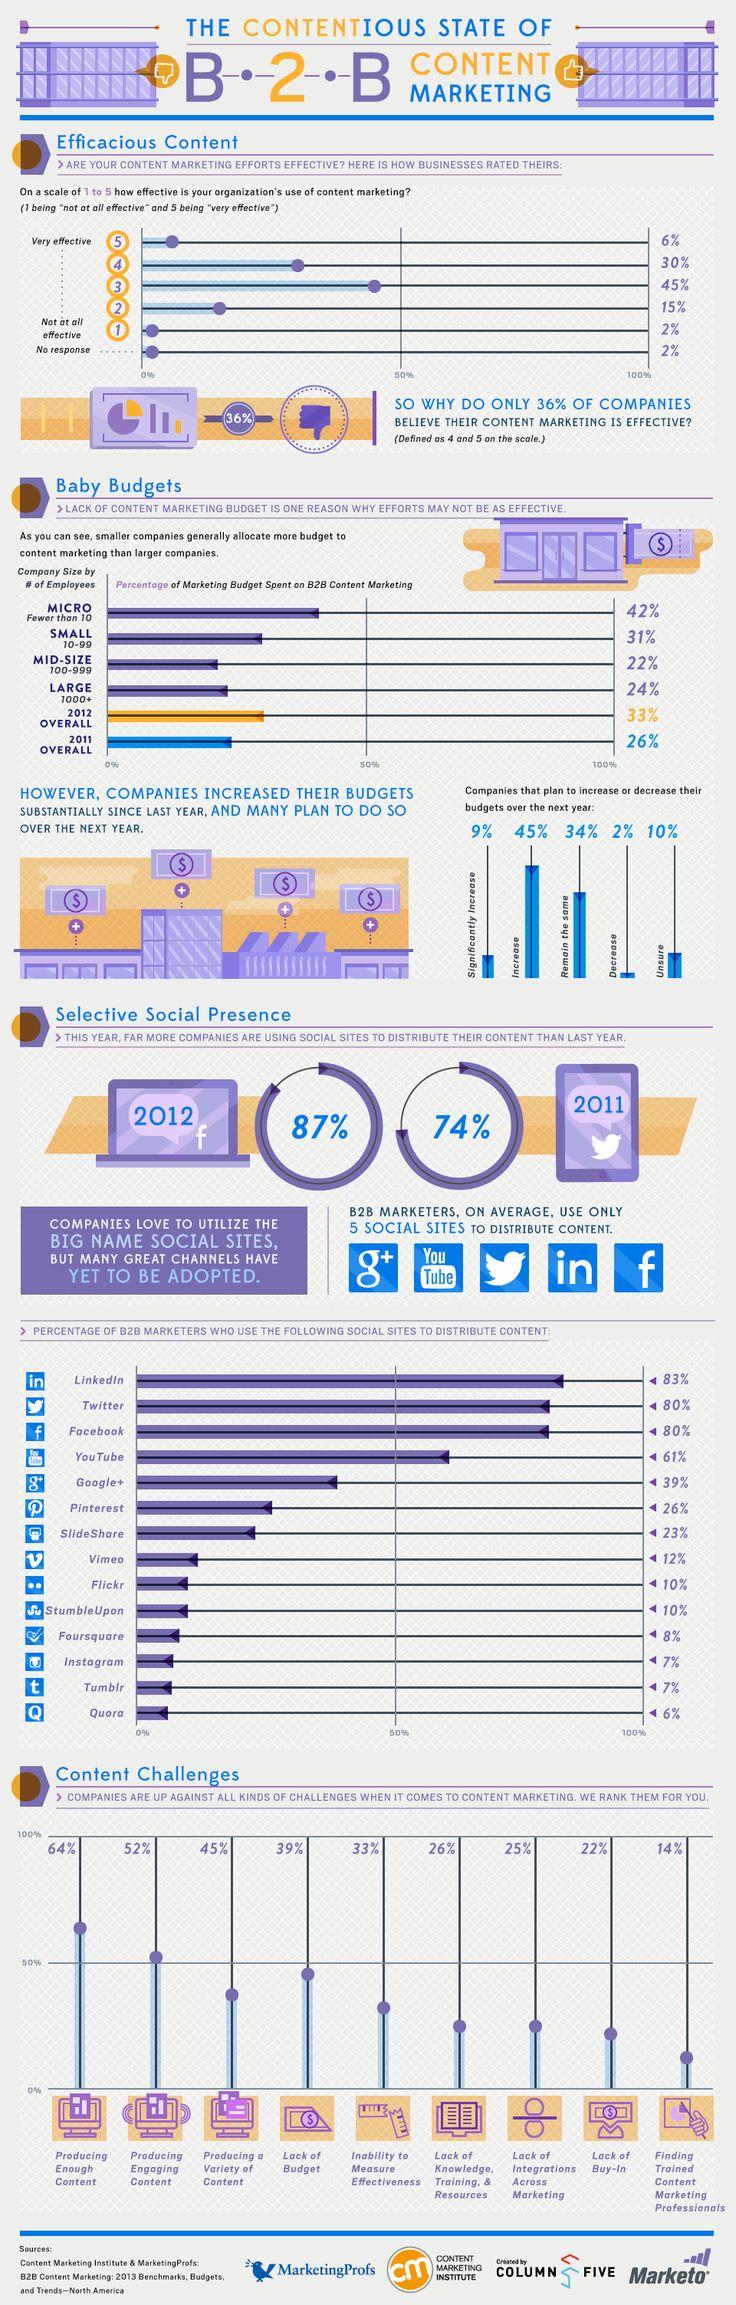 Contentmarketing voor B2B grote prioriteit [infographic] - Frankwatching